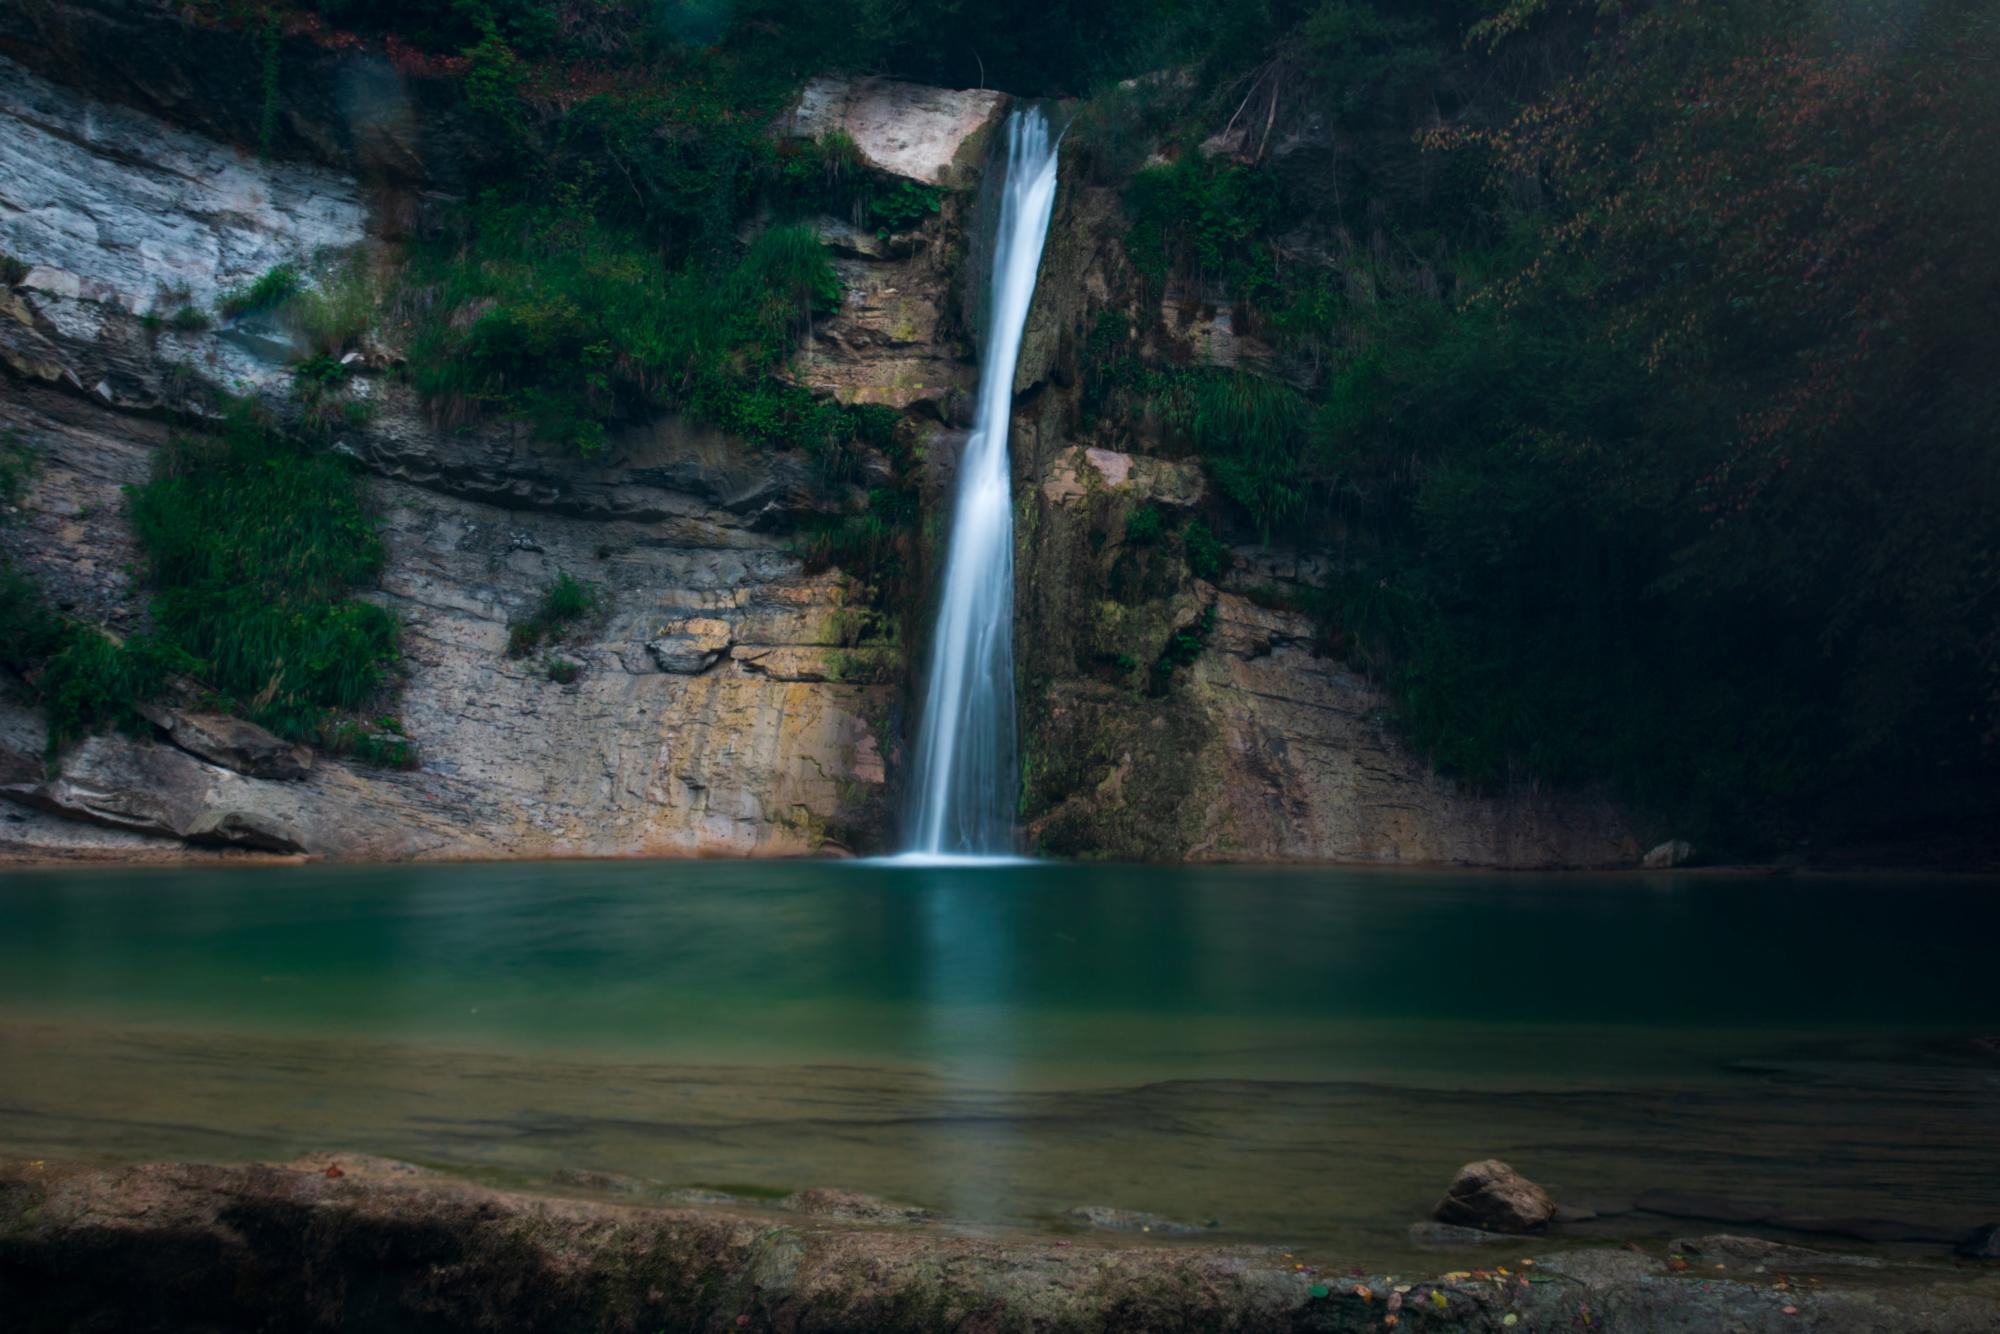 The waterfall ...